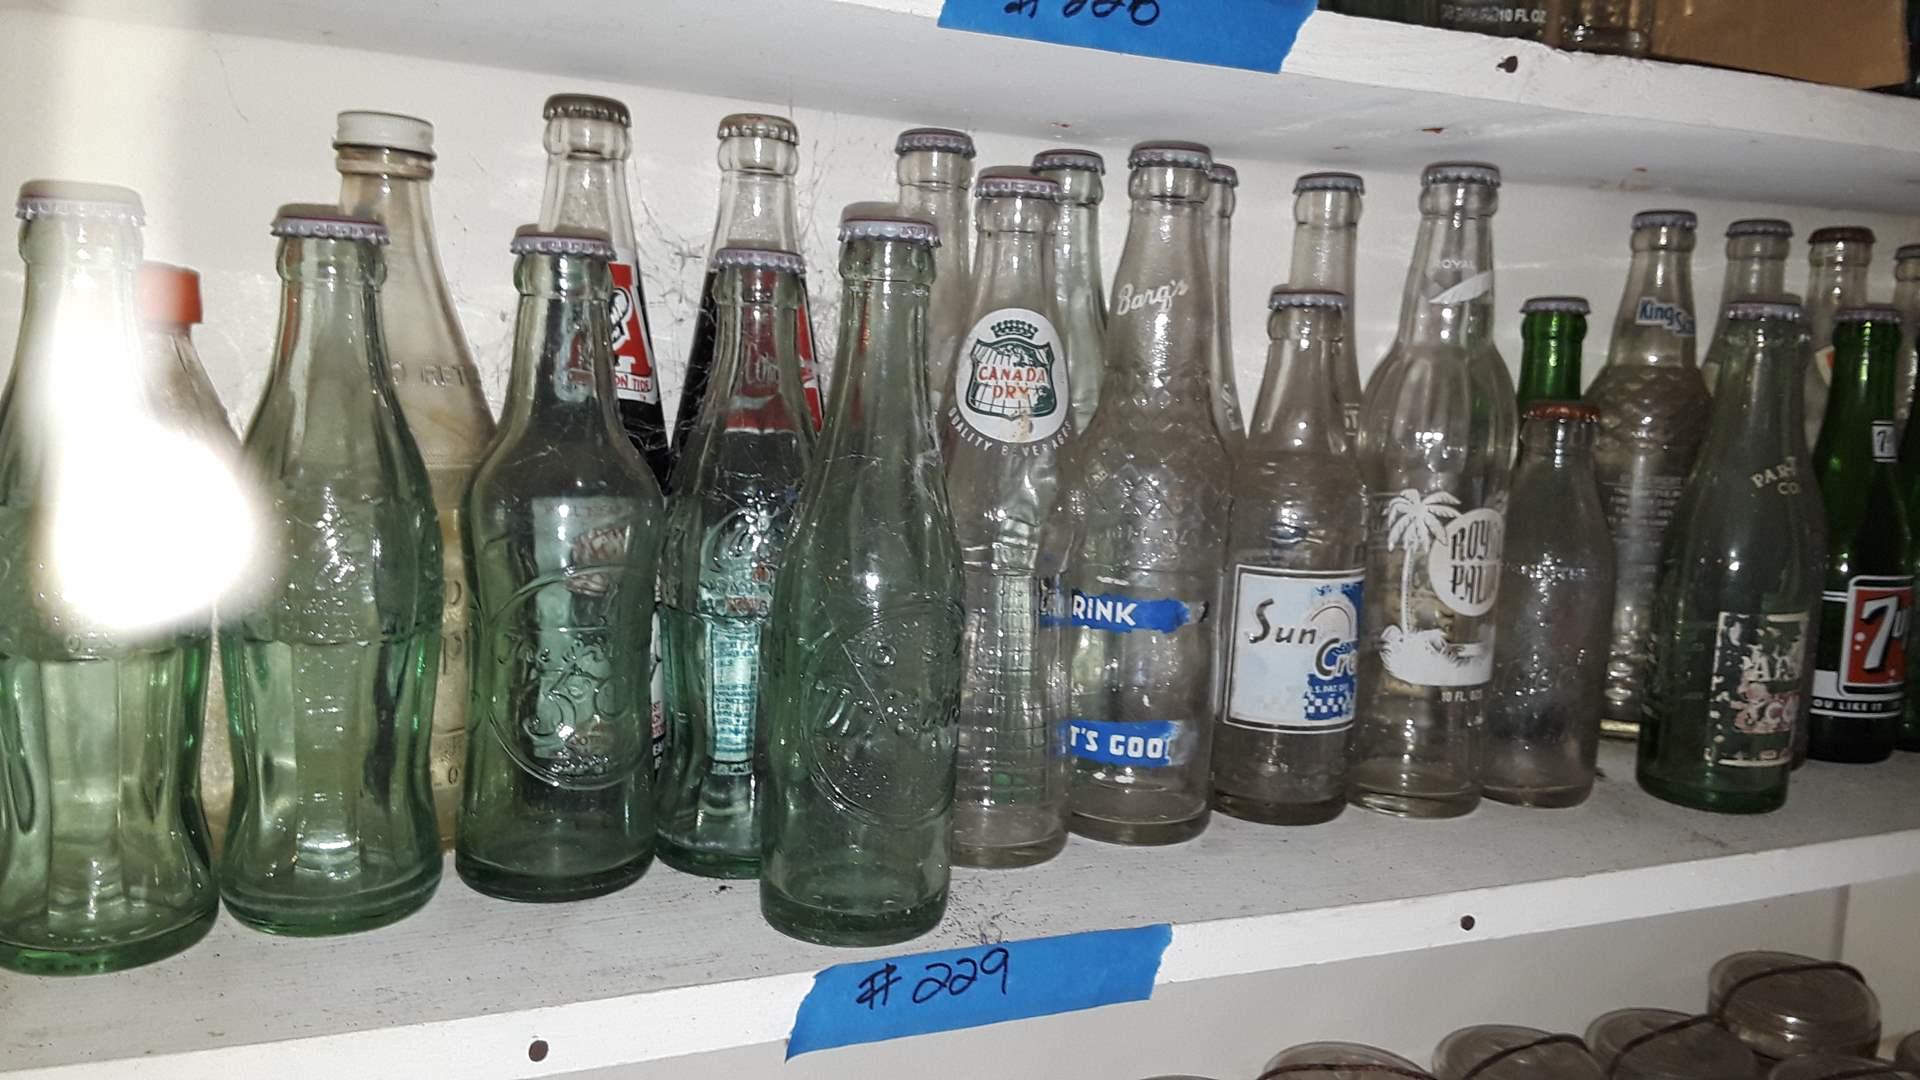 Lot # 229 COLLECTIBLE SODA BOTTLES, ALABAMA, 7-UP, EMBOSSED DR PEPPER